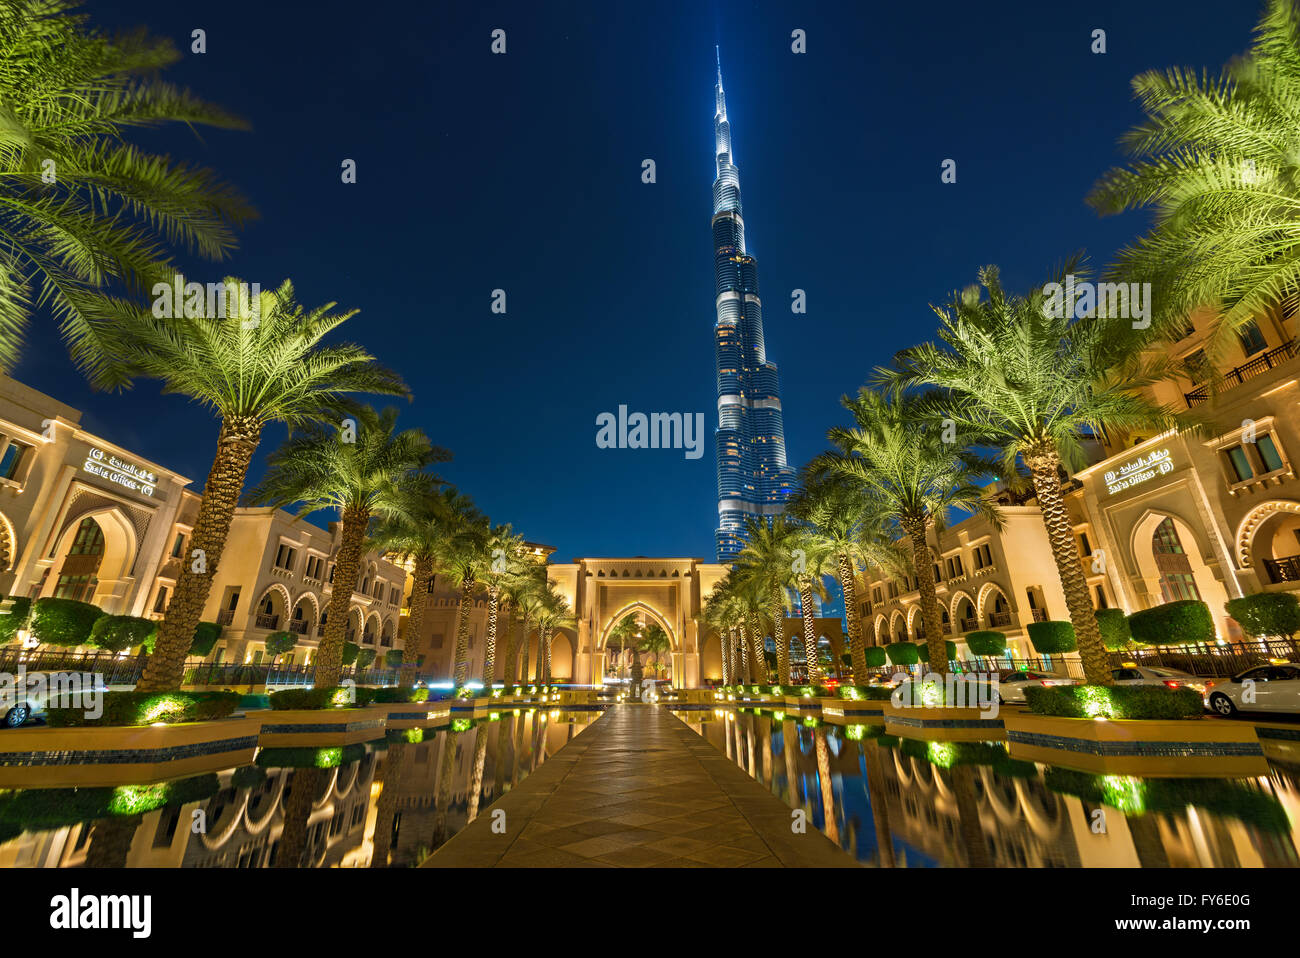 Dubai, UAE, 28 April 2013, Burj Khalifa Tower view from Al Qasr Downtown Dubai - United Arab Emirates - Stock Image